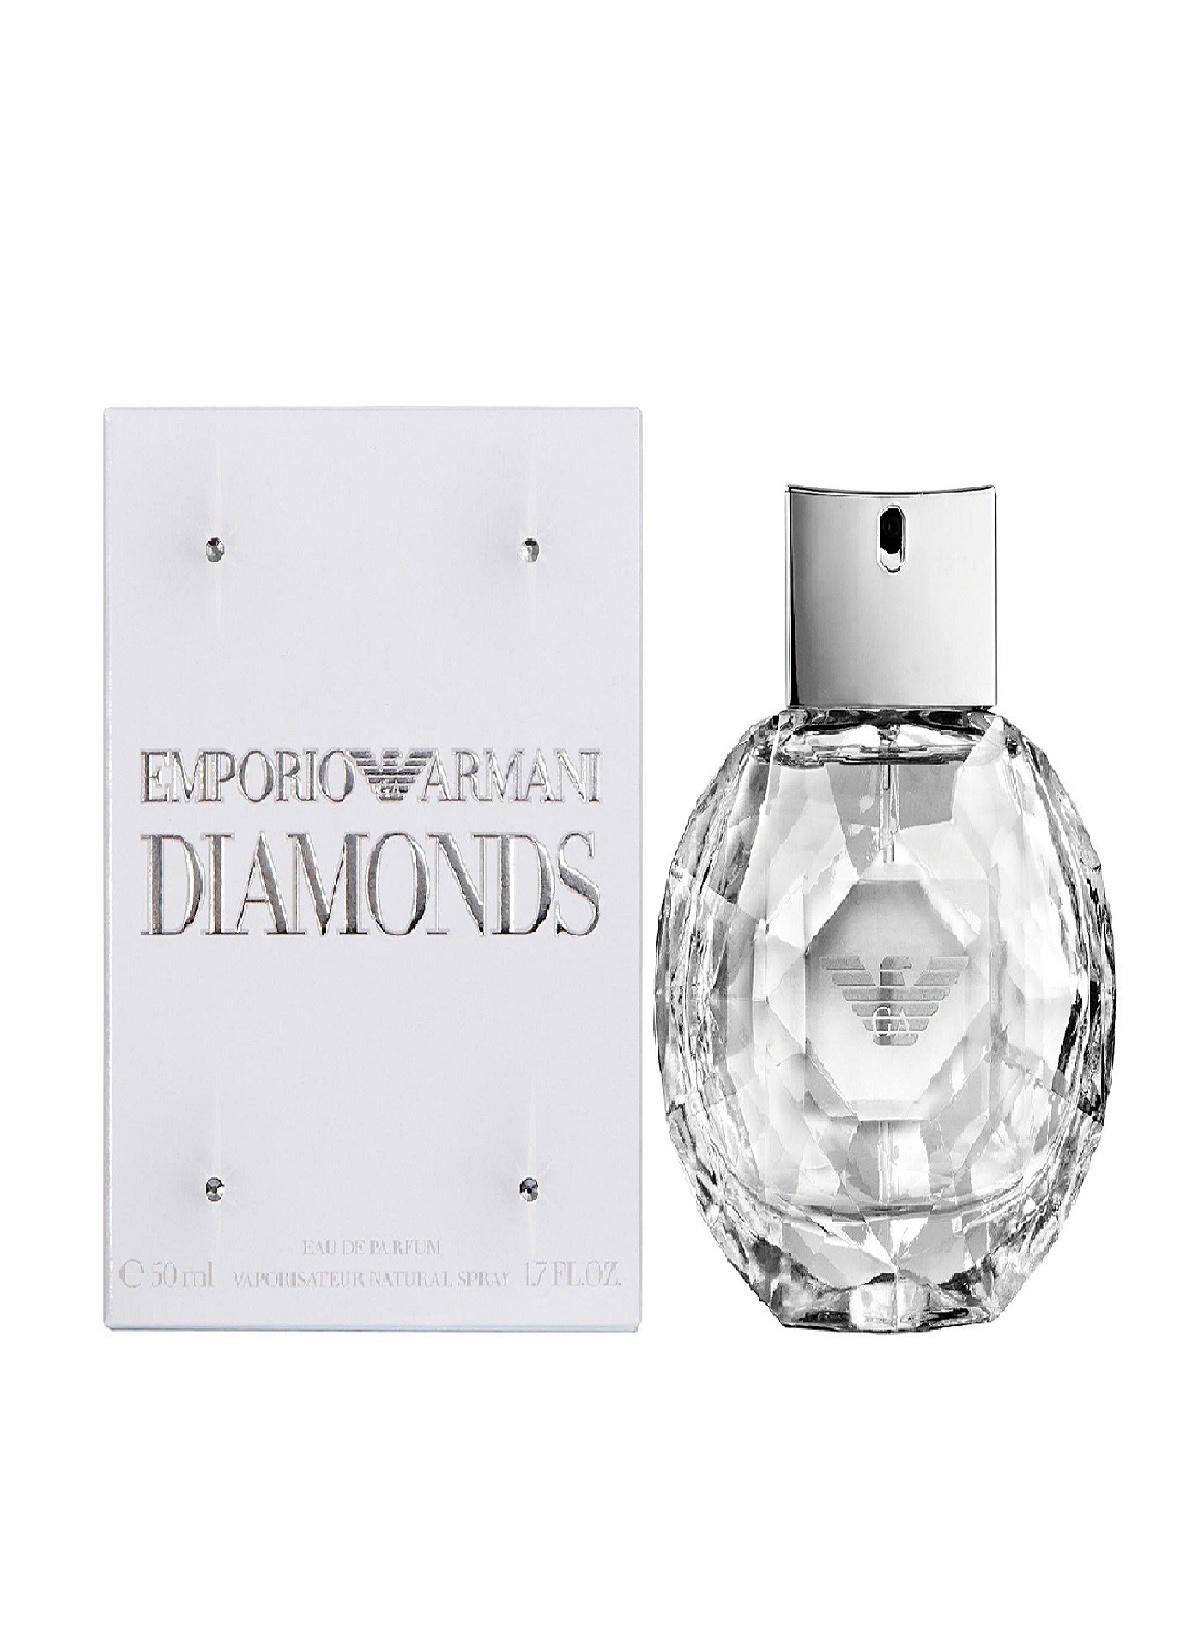 Kadın Emporio Armani Diamonds Elle Edp 50 Ml Parfüm